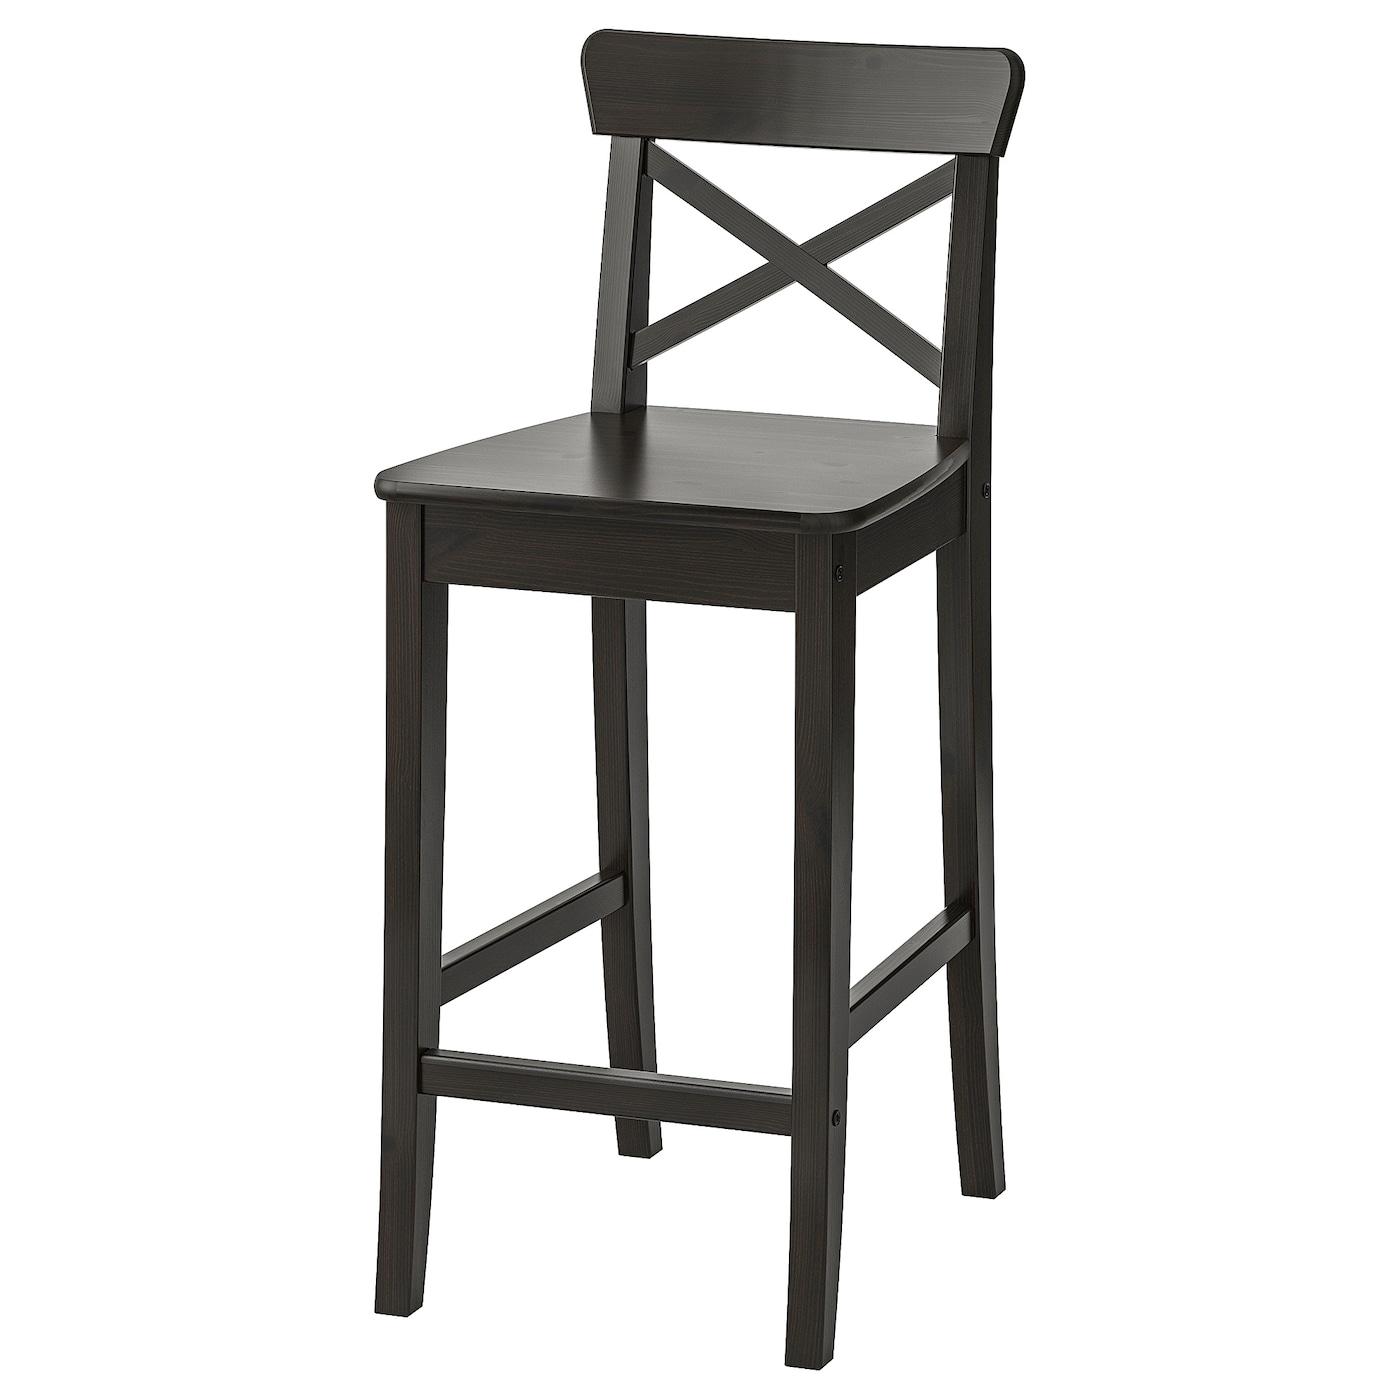 INGOLF Bar stool with backrest   brown black 9 cm